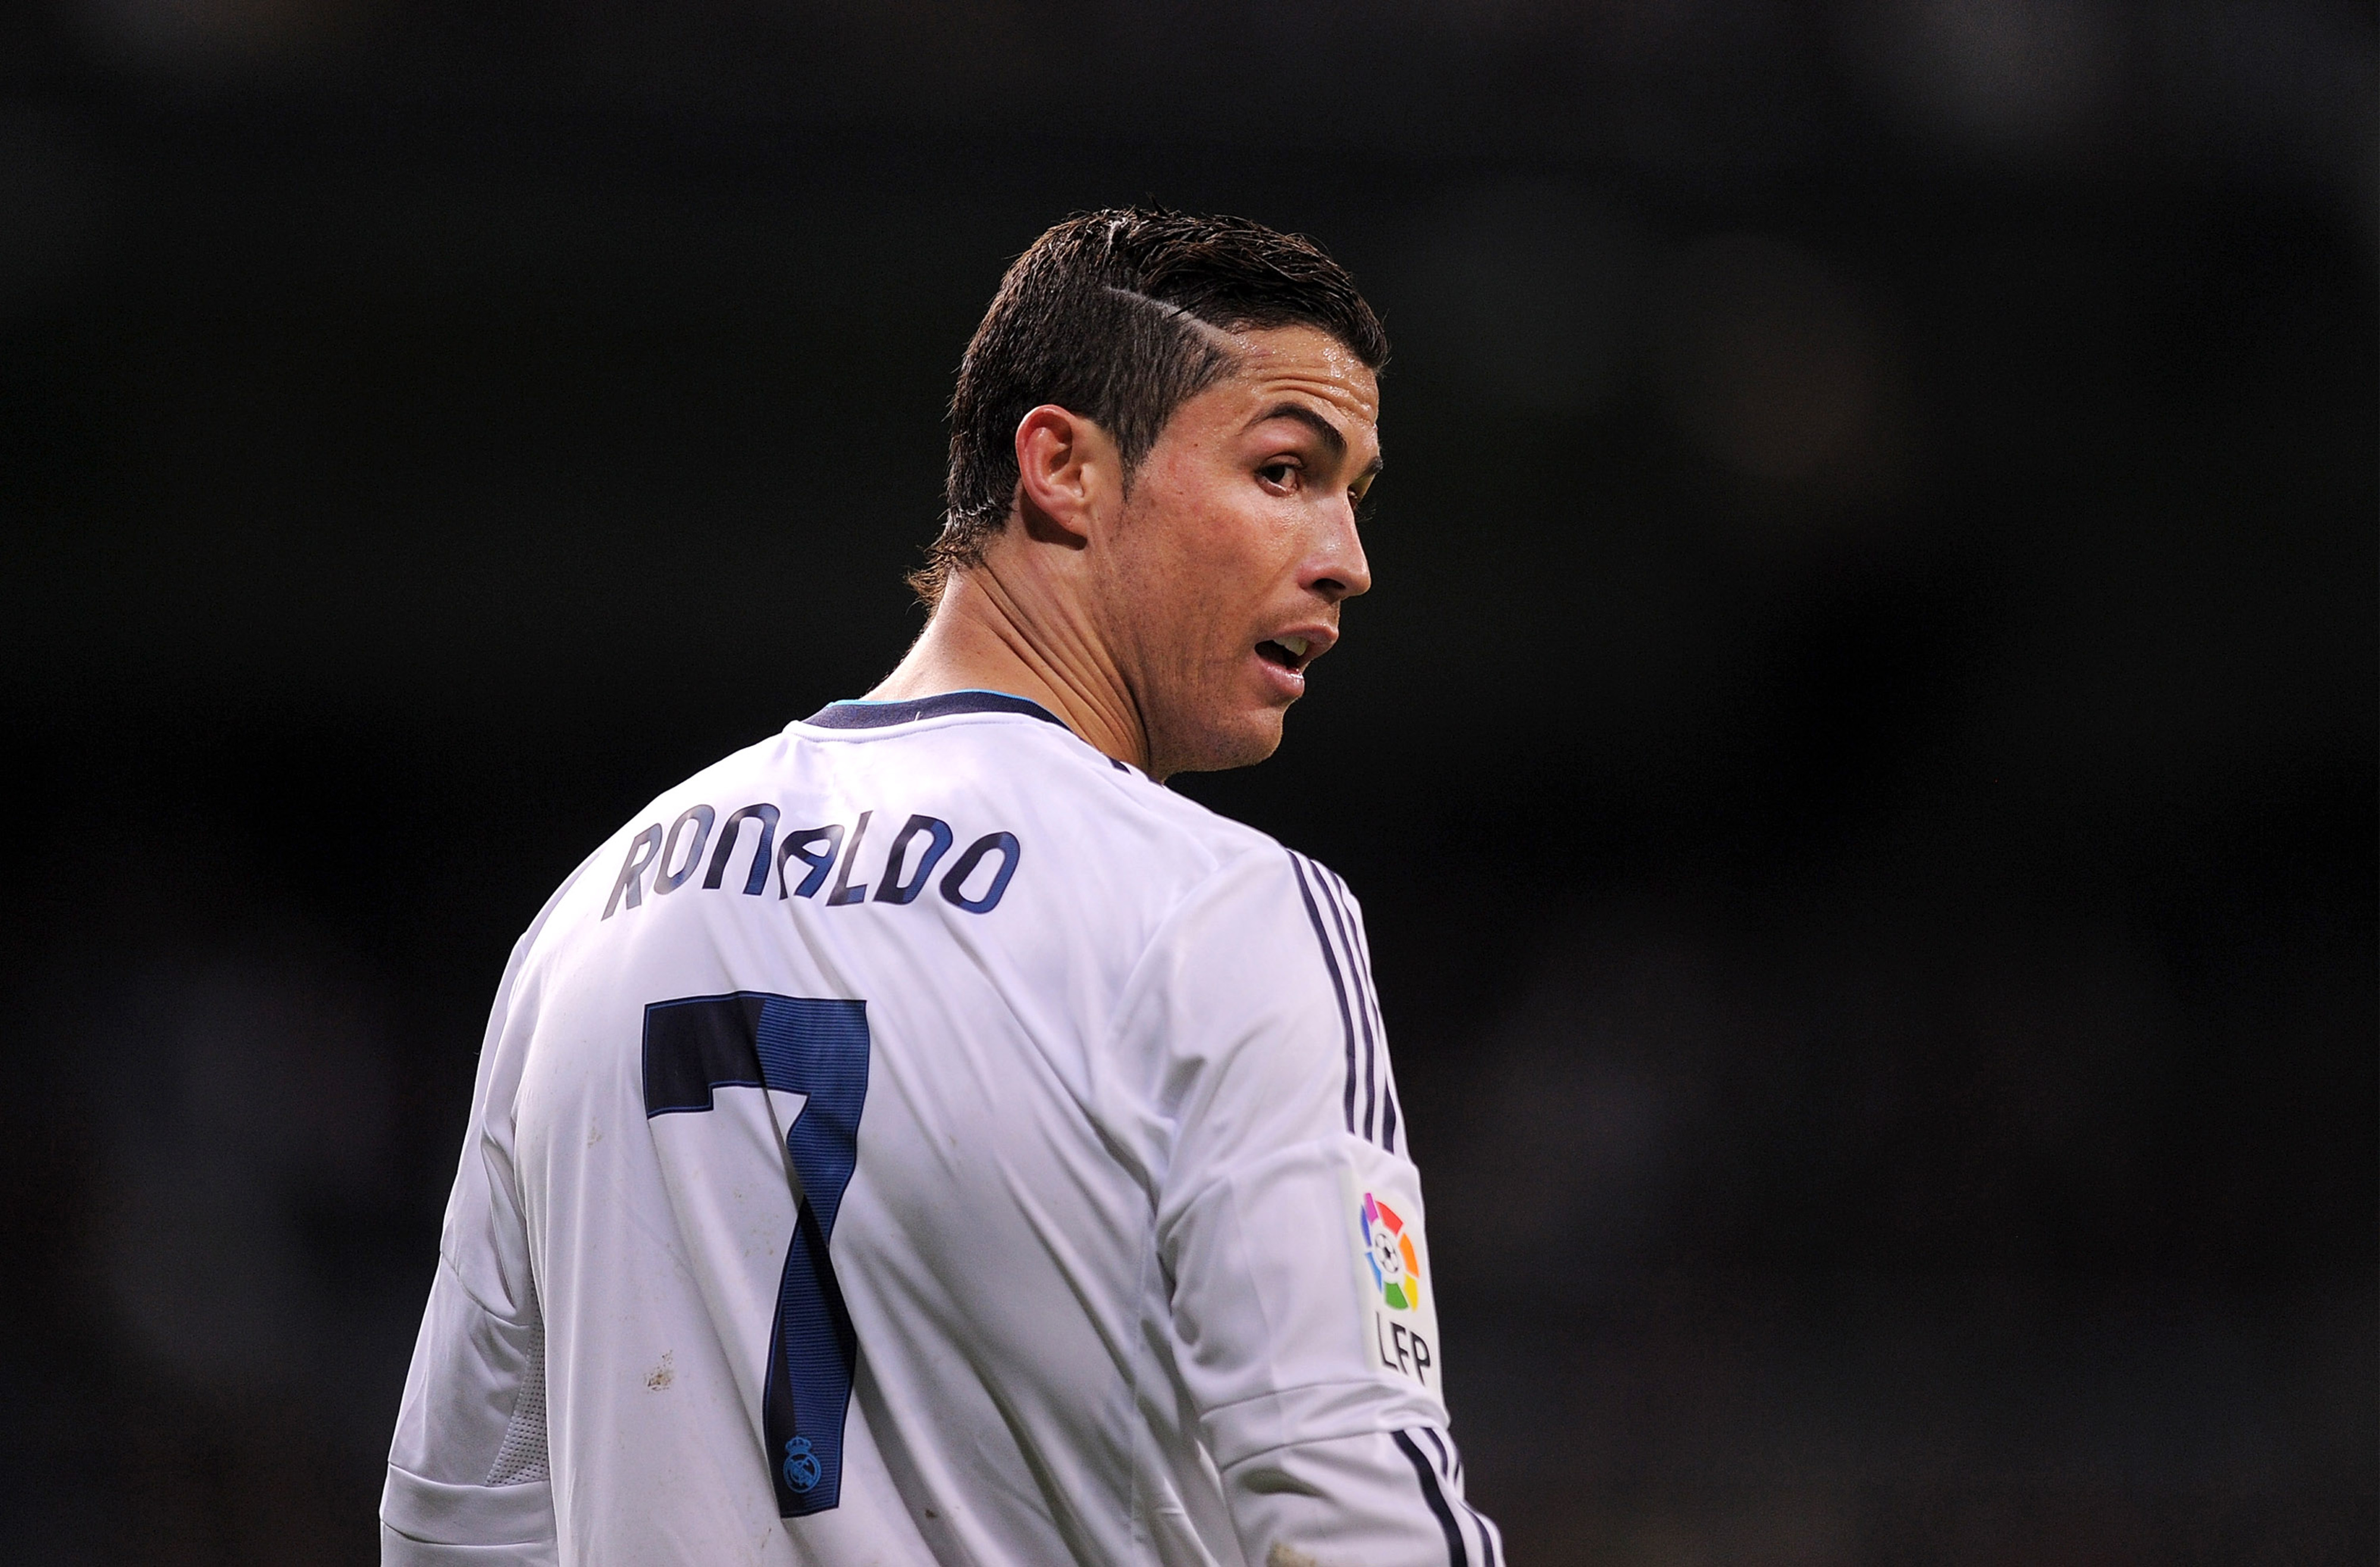 The 7 Wonders: Football's magic number